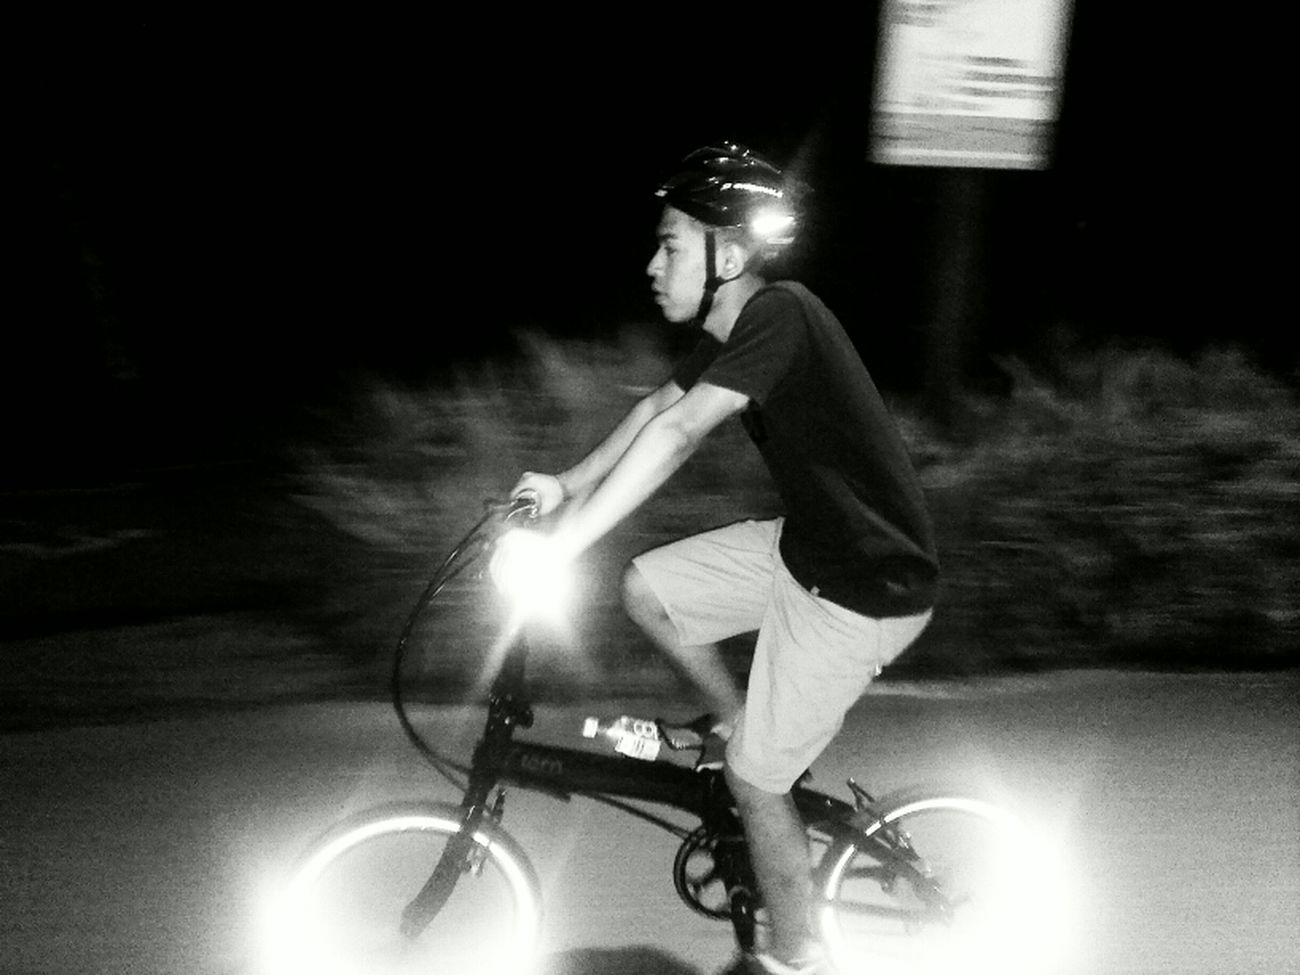 TRON bicycle. Blackandwhite